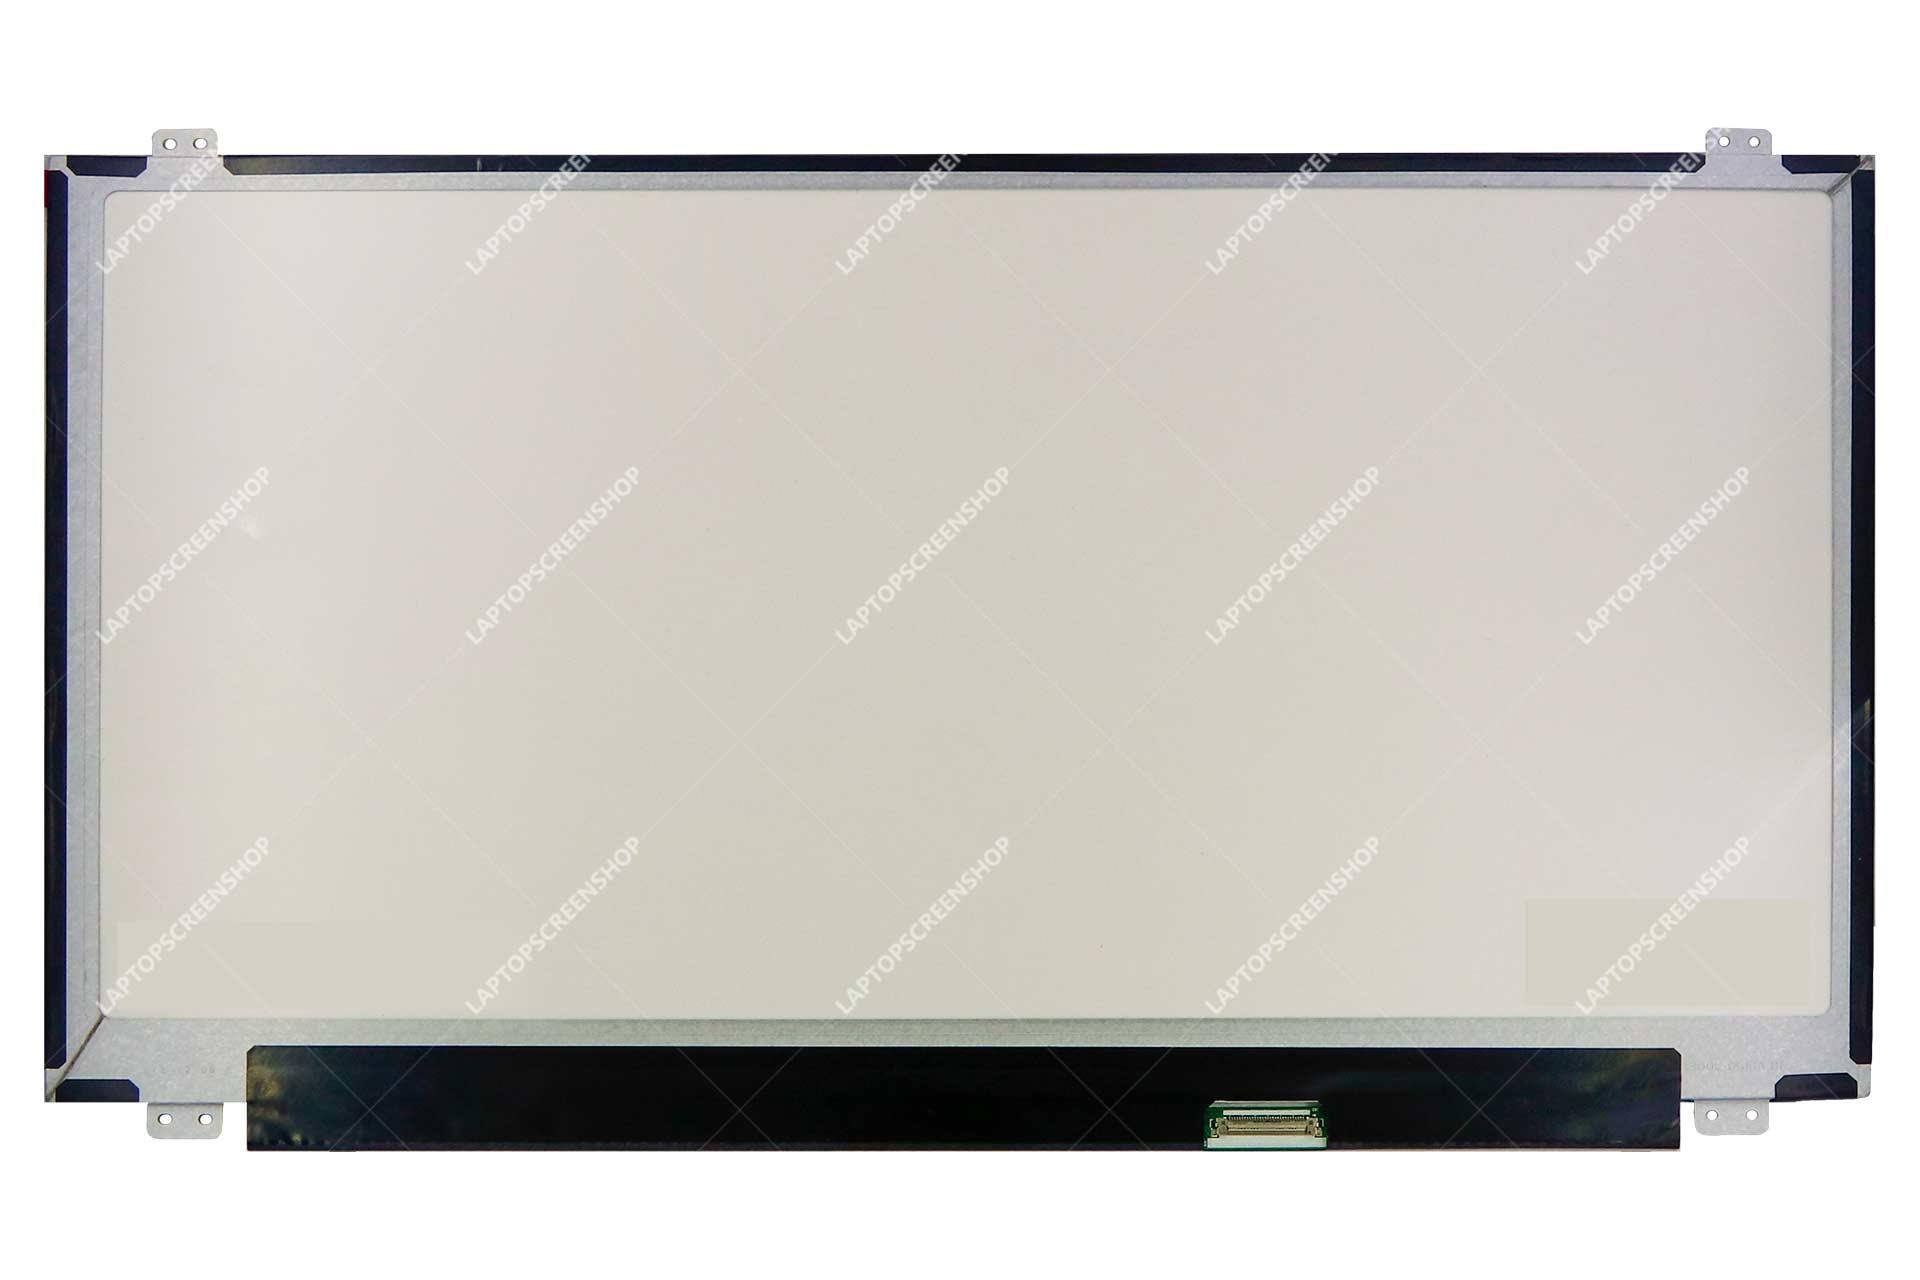 LENOVO-IDEAPAD-Z510-59400195-LCD  FHD فروشگاه لپ تاپ اسکرين   تعمير لپ تاپ